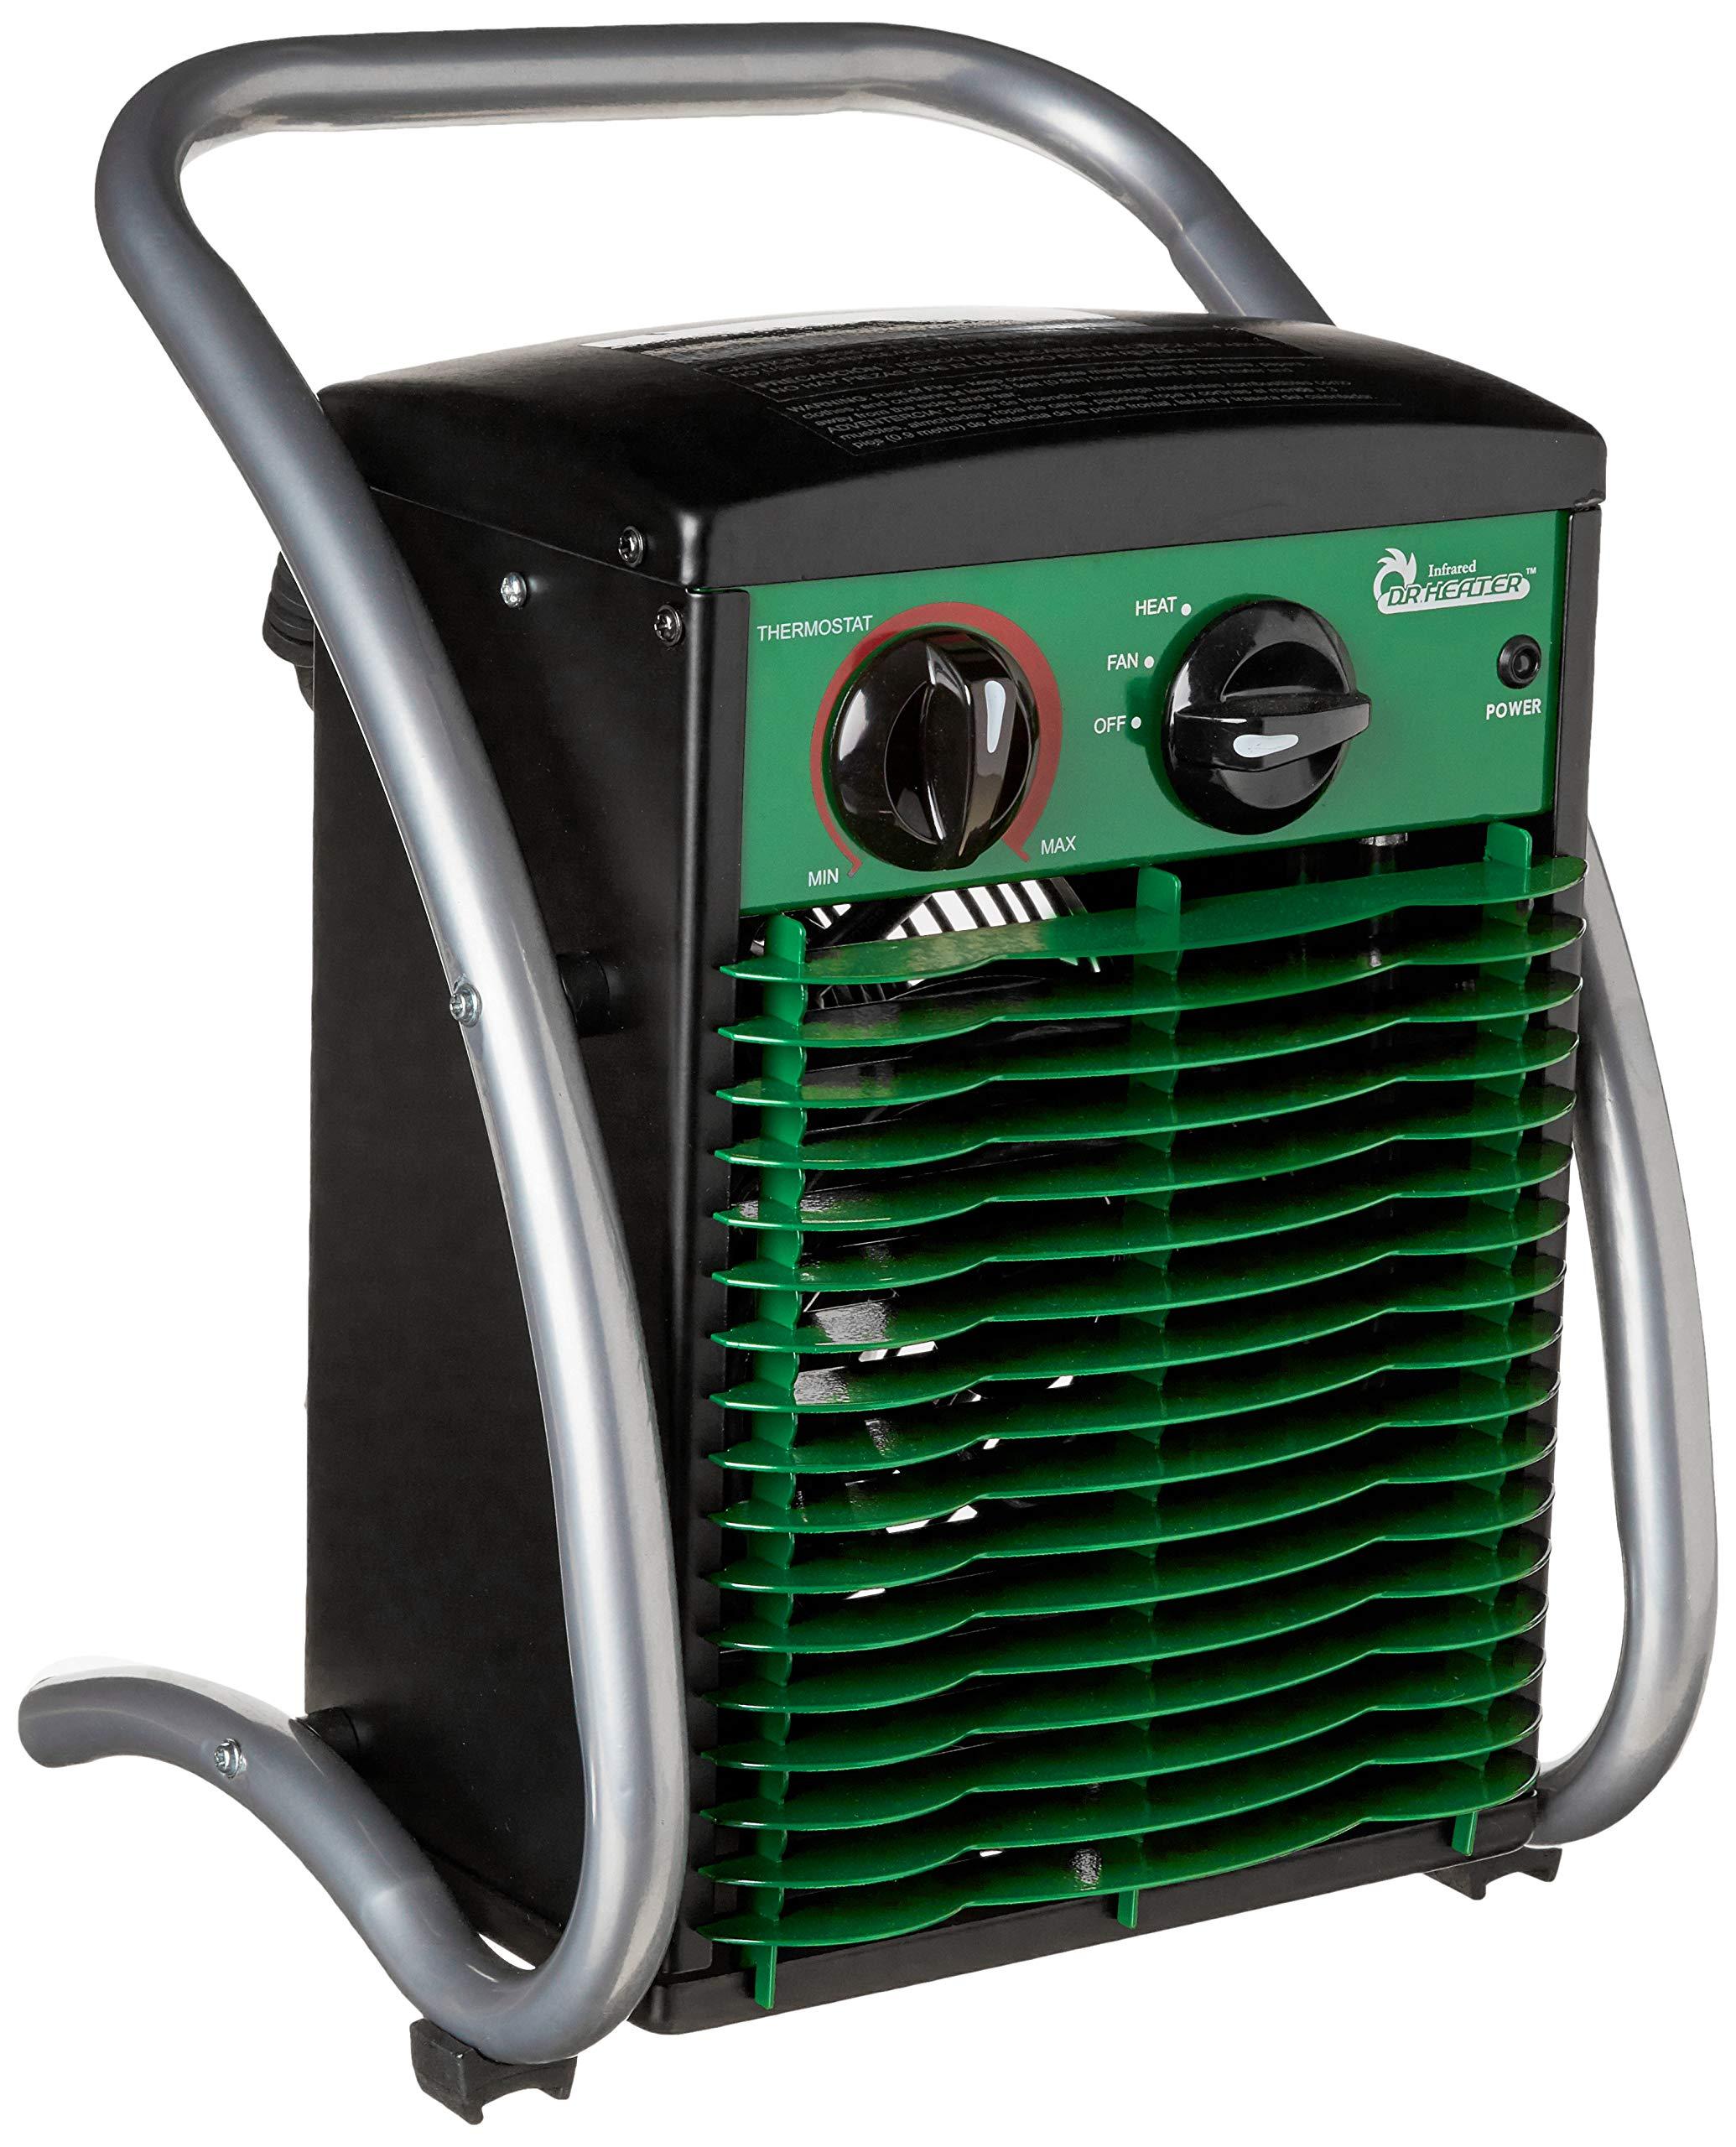 Dr. Heater DR218-1500W Greenhouse Garage Workshop Infrared Heater, 1500-watt by Dr Infrared Heater